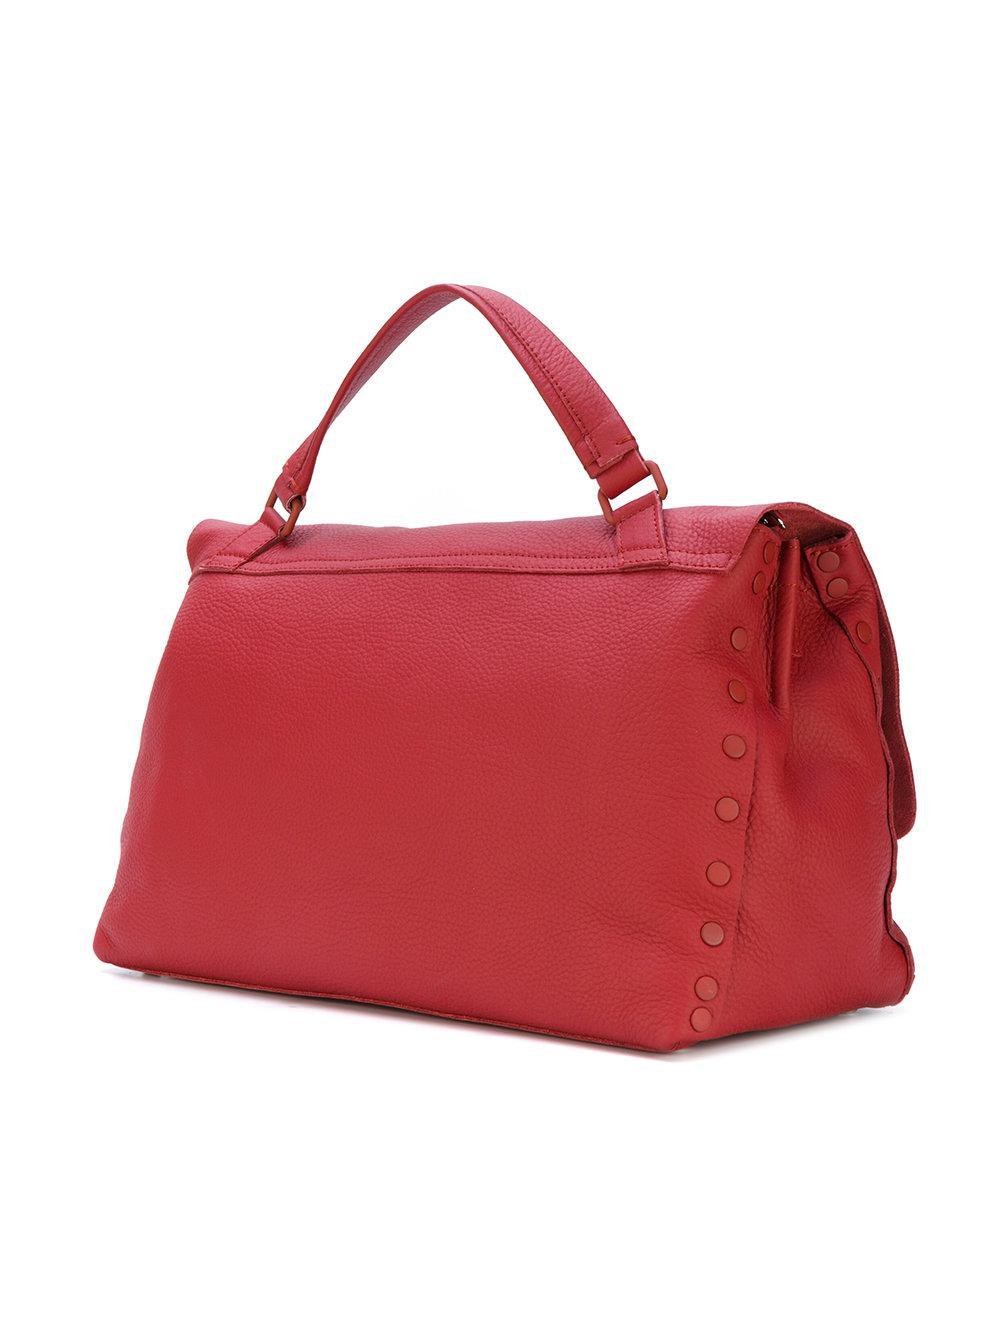 Zanellato Leather Double Latch Tote Bag in Red